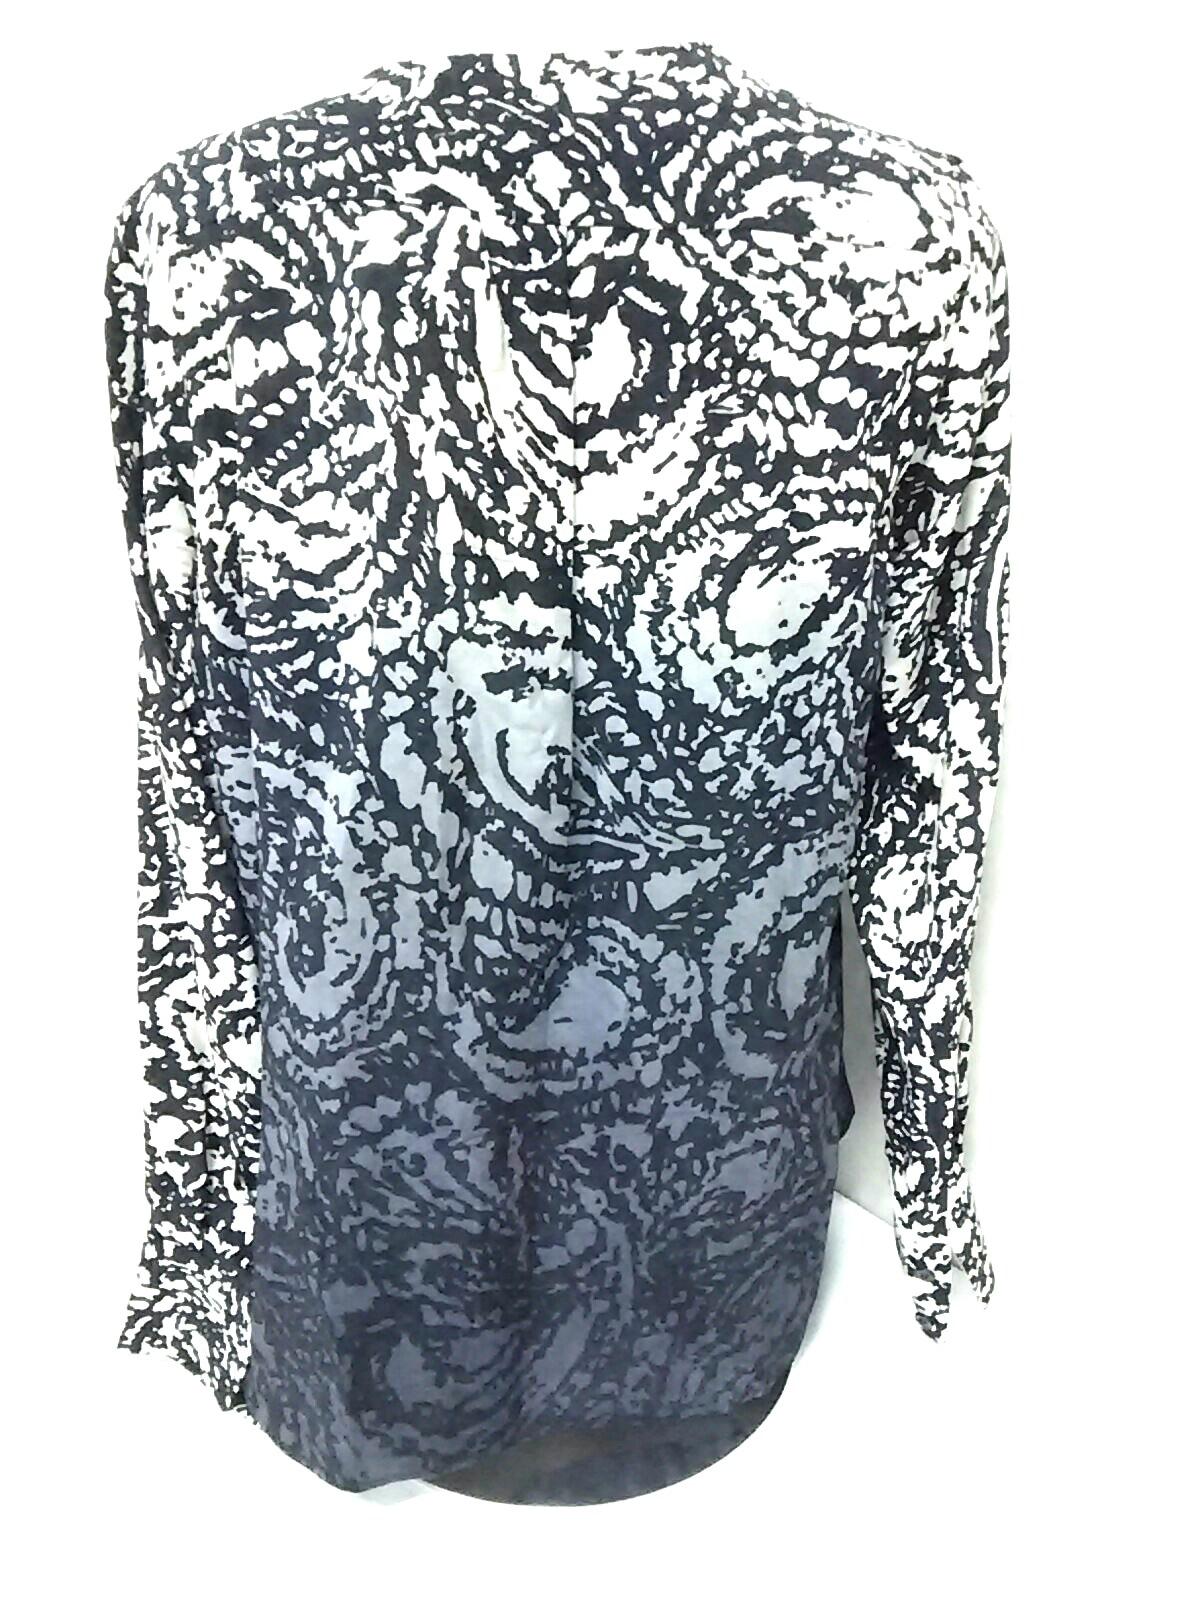 Max Mara(マックスマーラ)のシャツブラウス